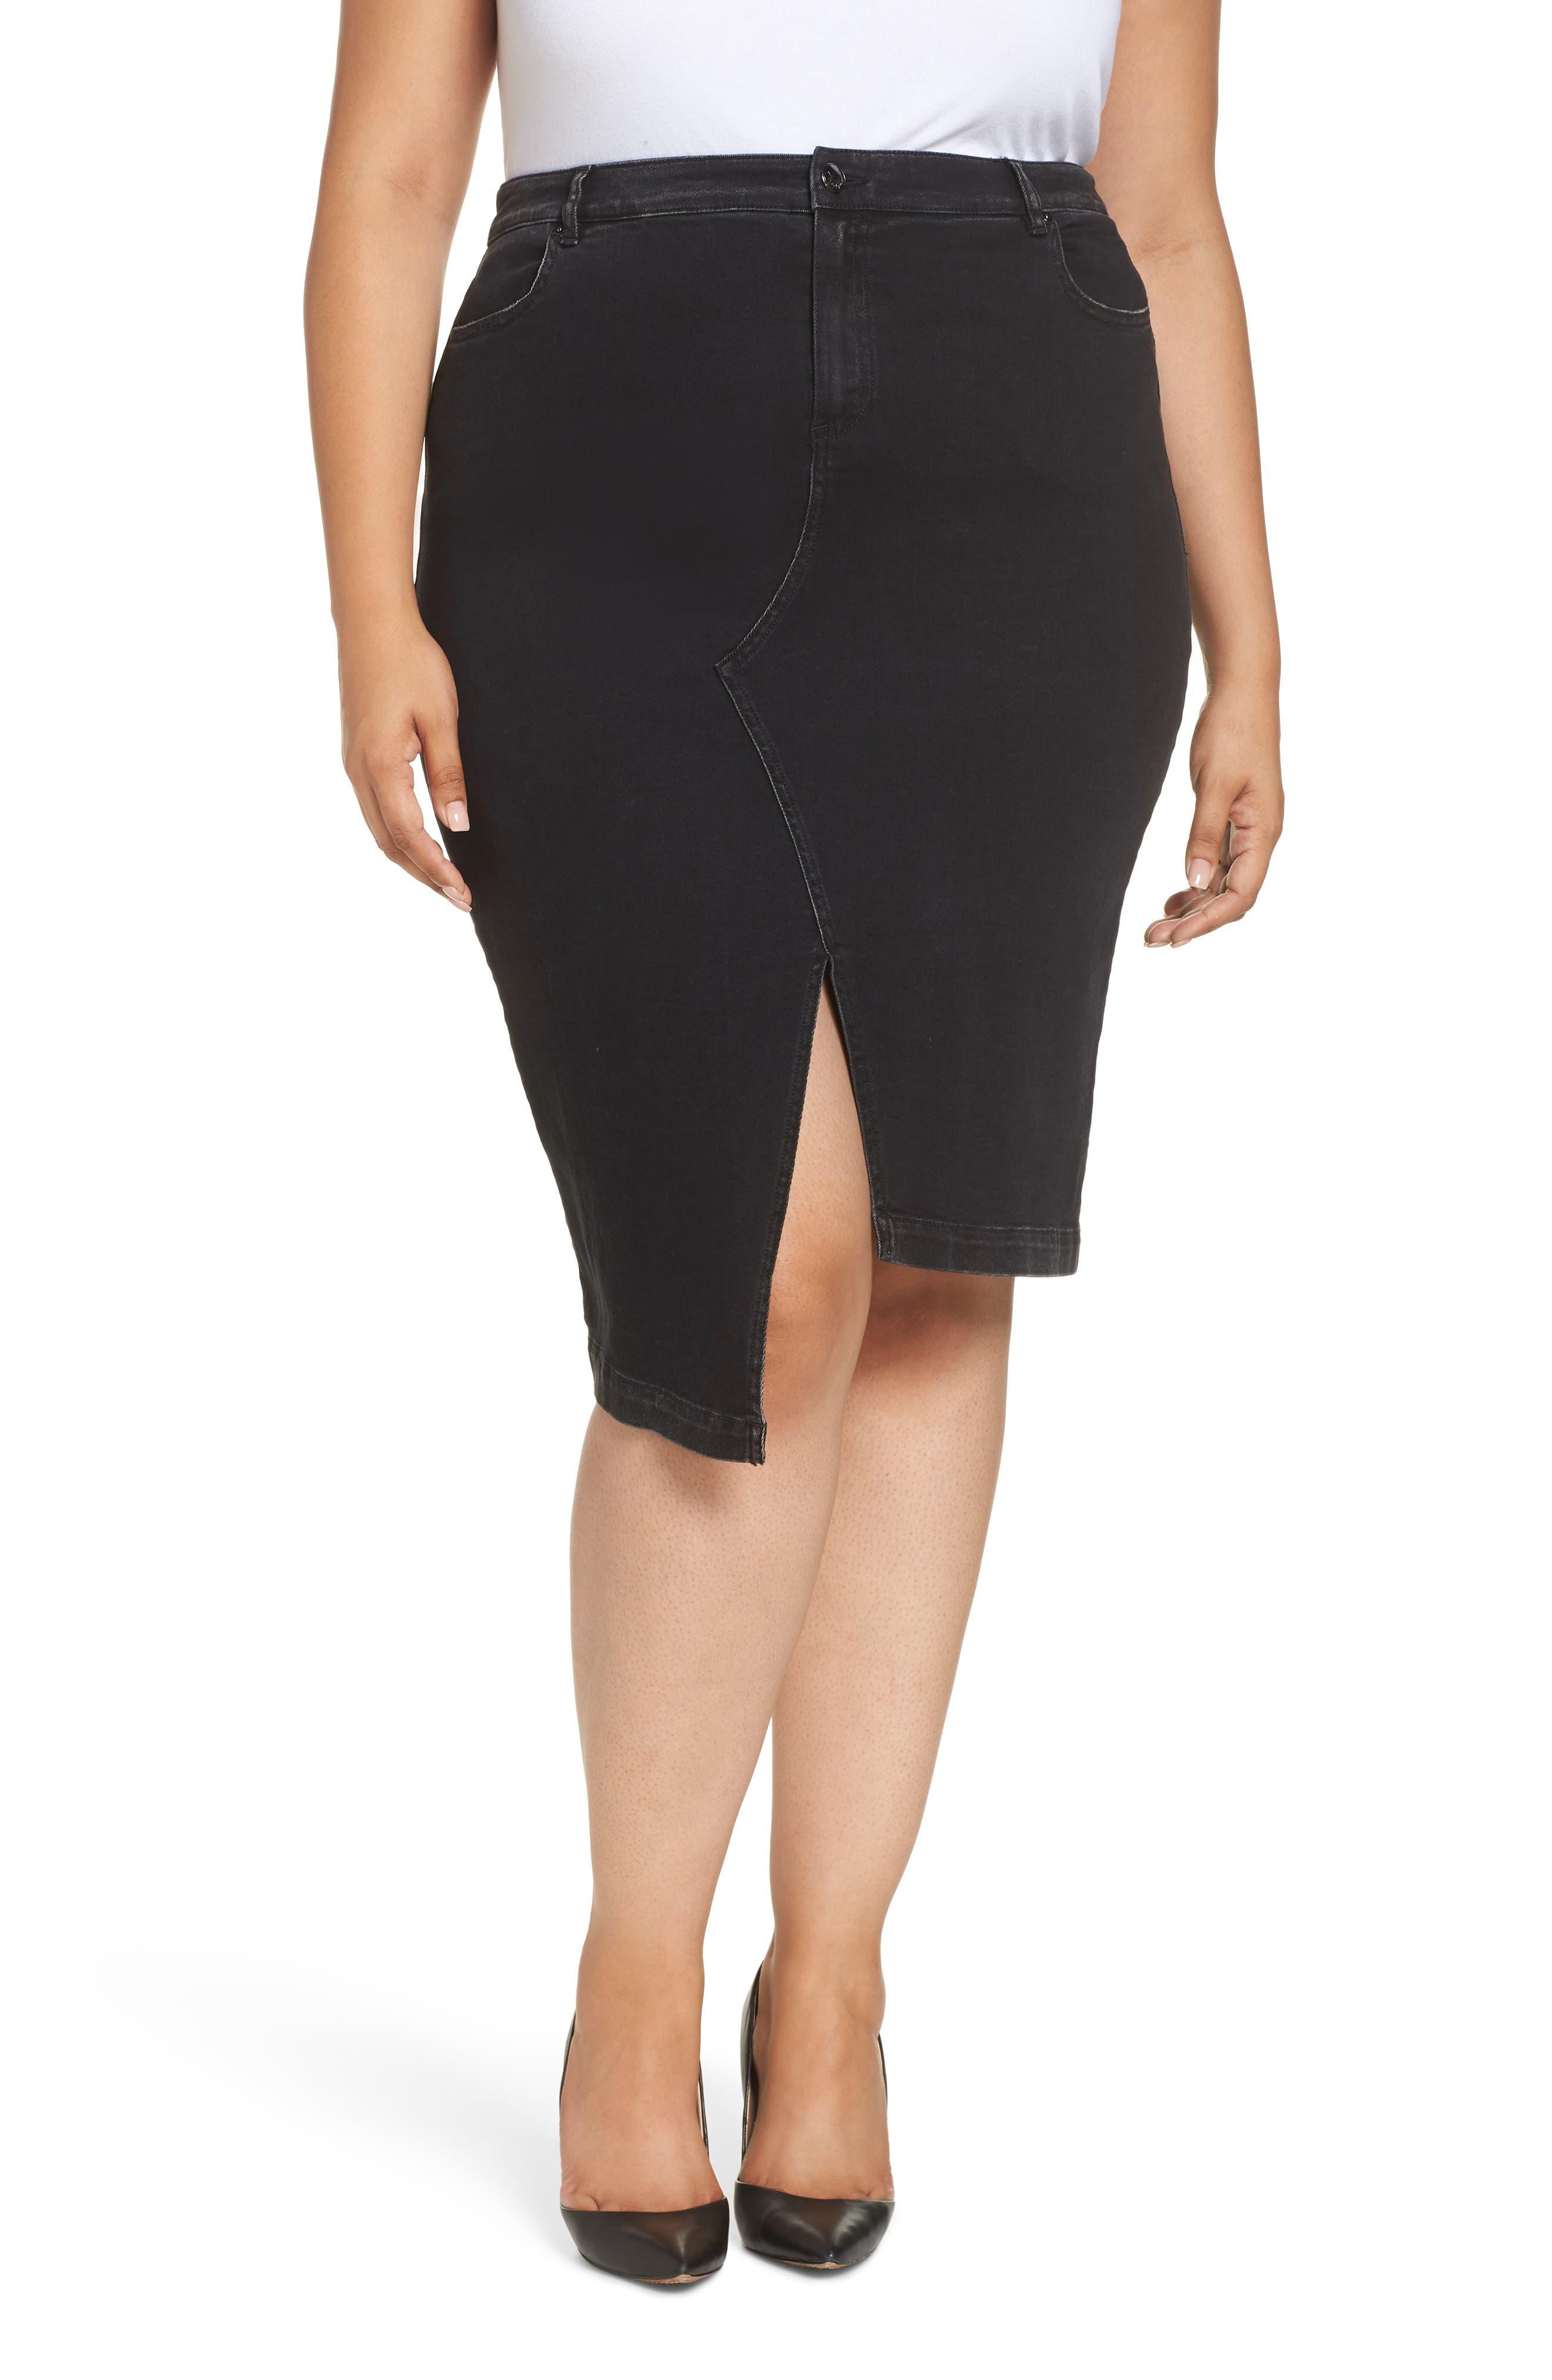 ASHLEY GRAHAM X MARINA RINALDI Canoa Asymmetrical Denim Skirt in Black 2